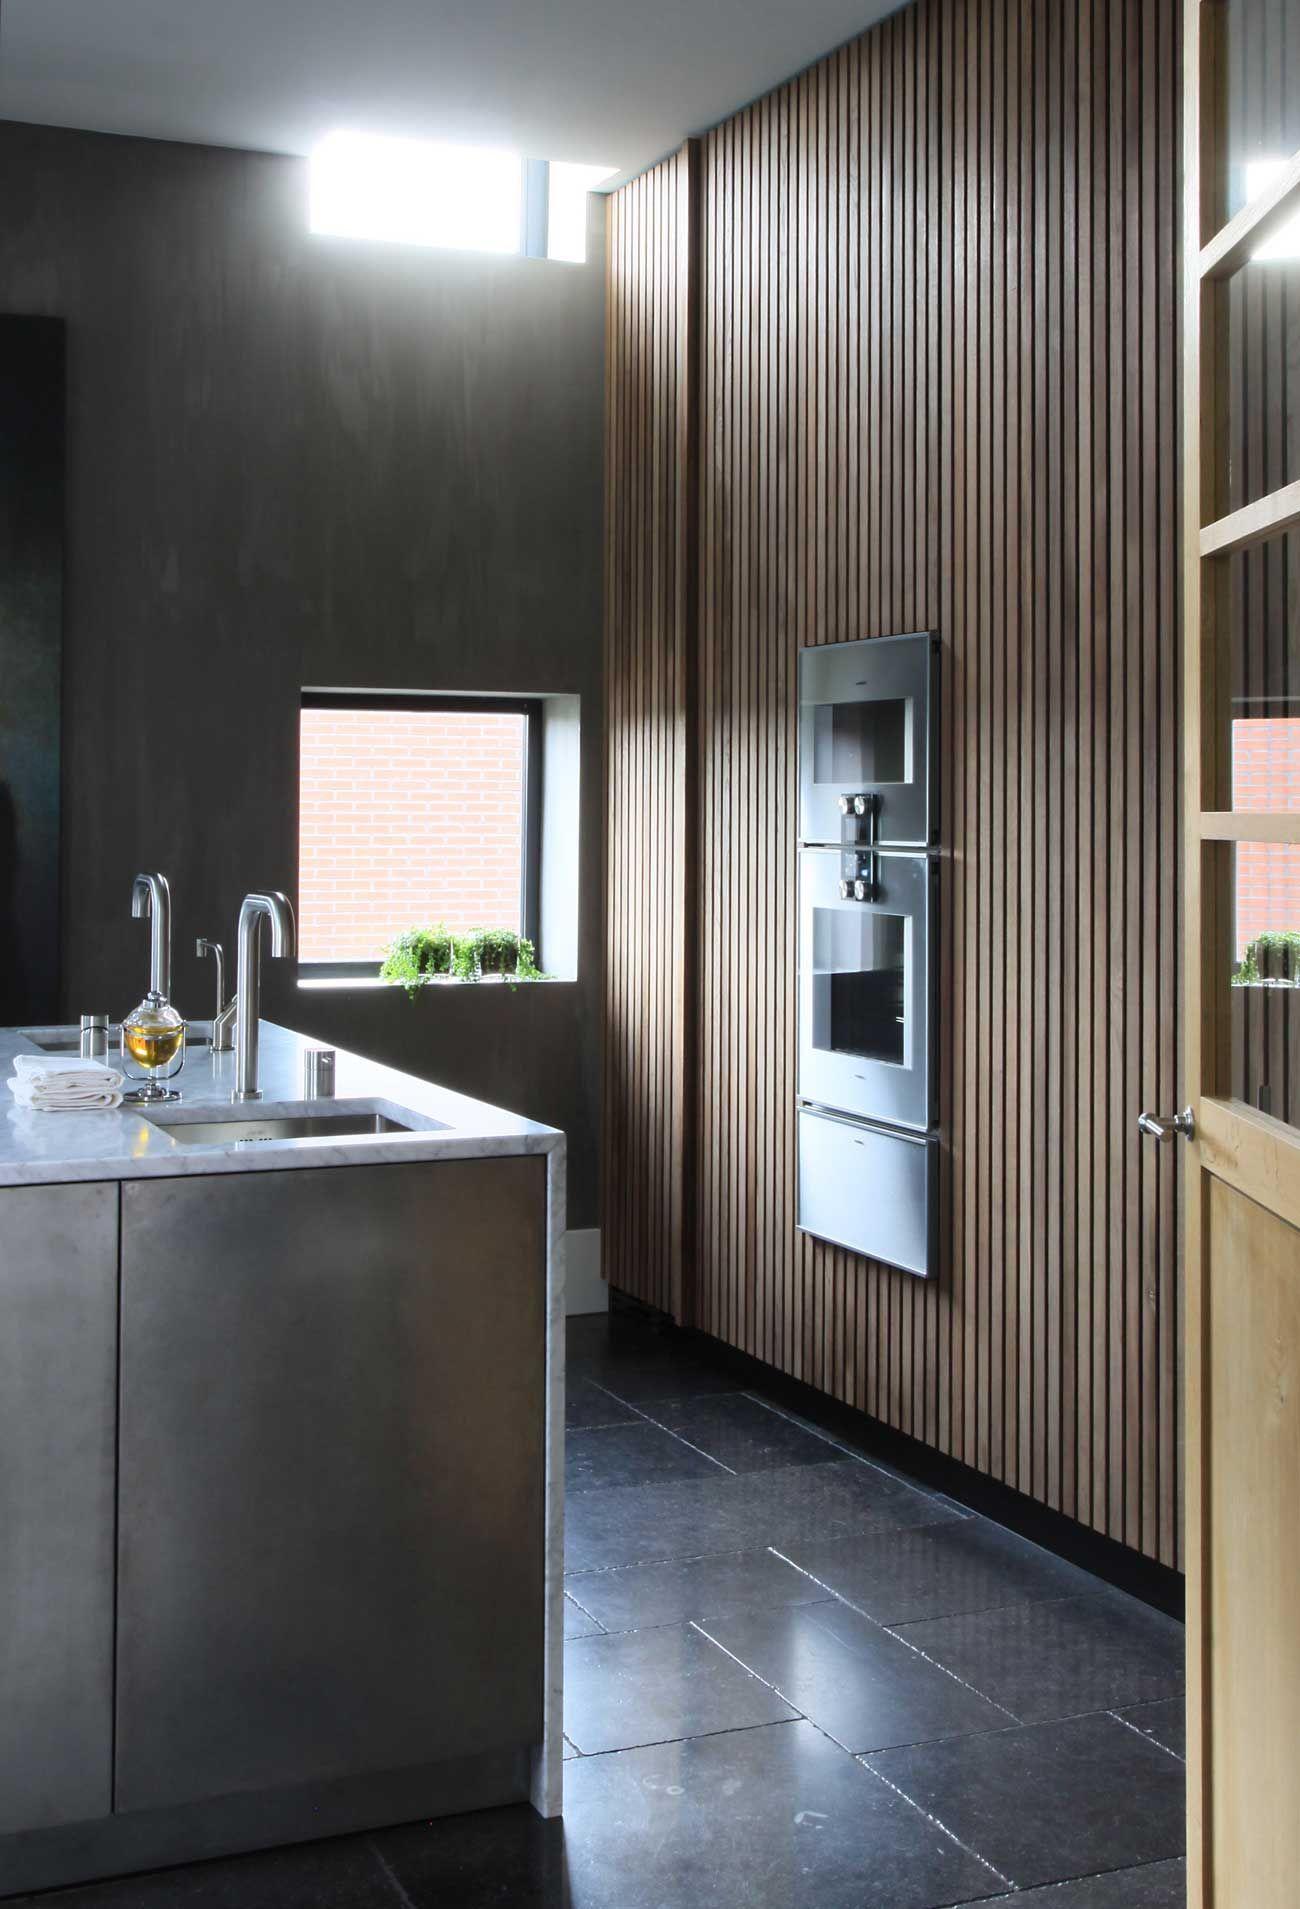 Modern Minimal Kitchen, Black Stone Floors, Slatted Wood Wall, Grey